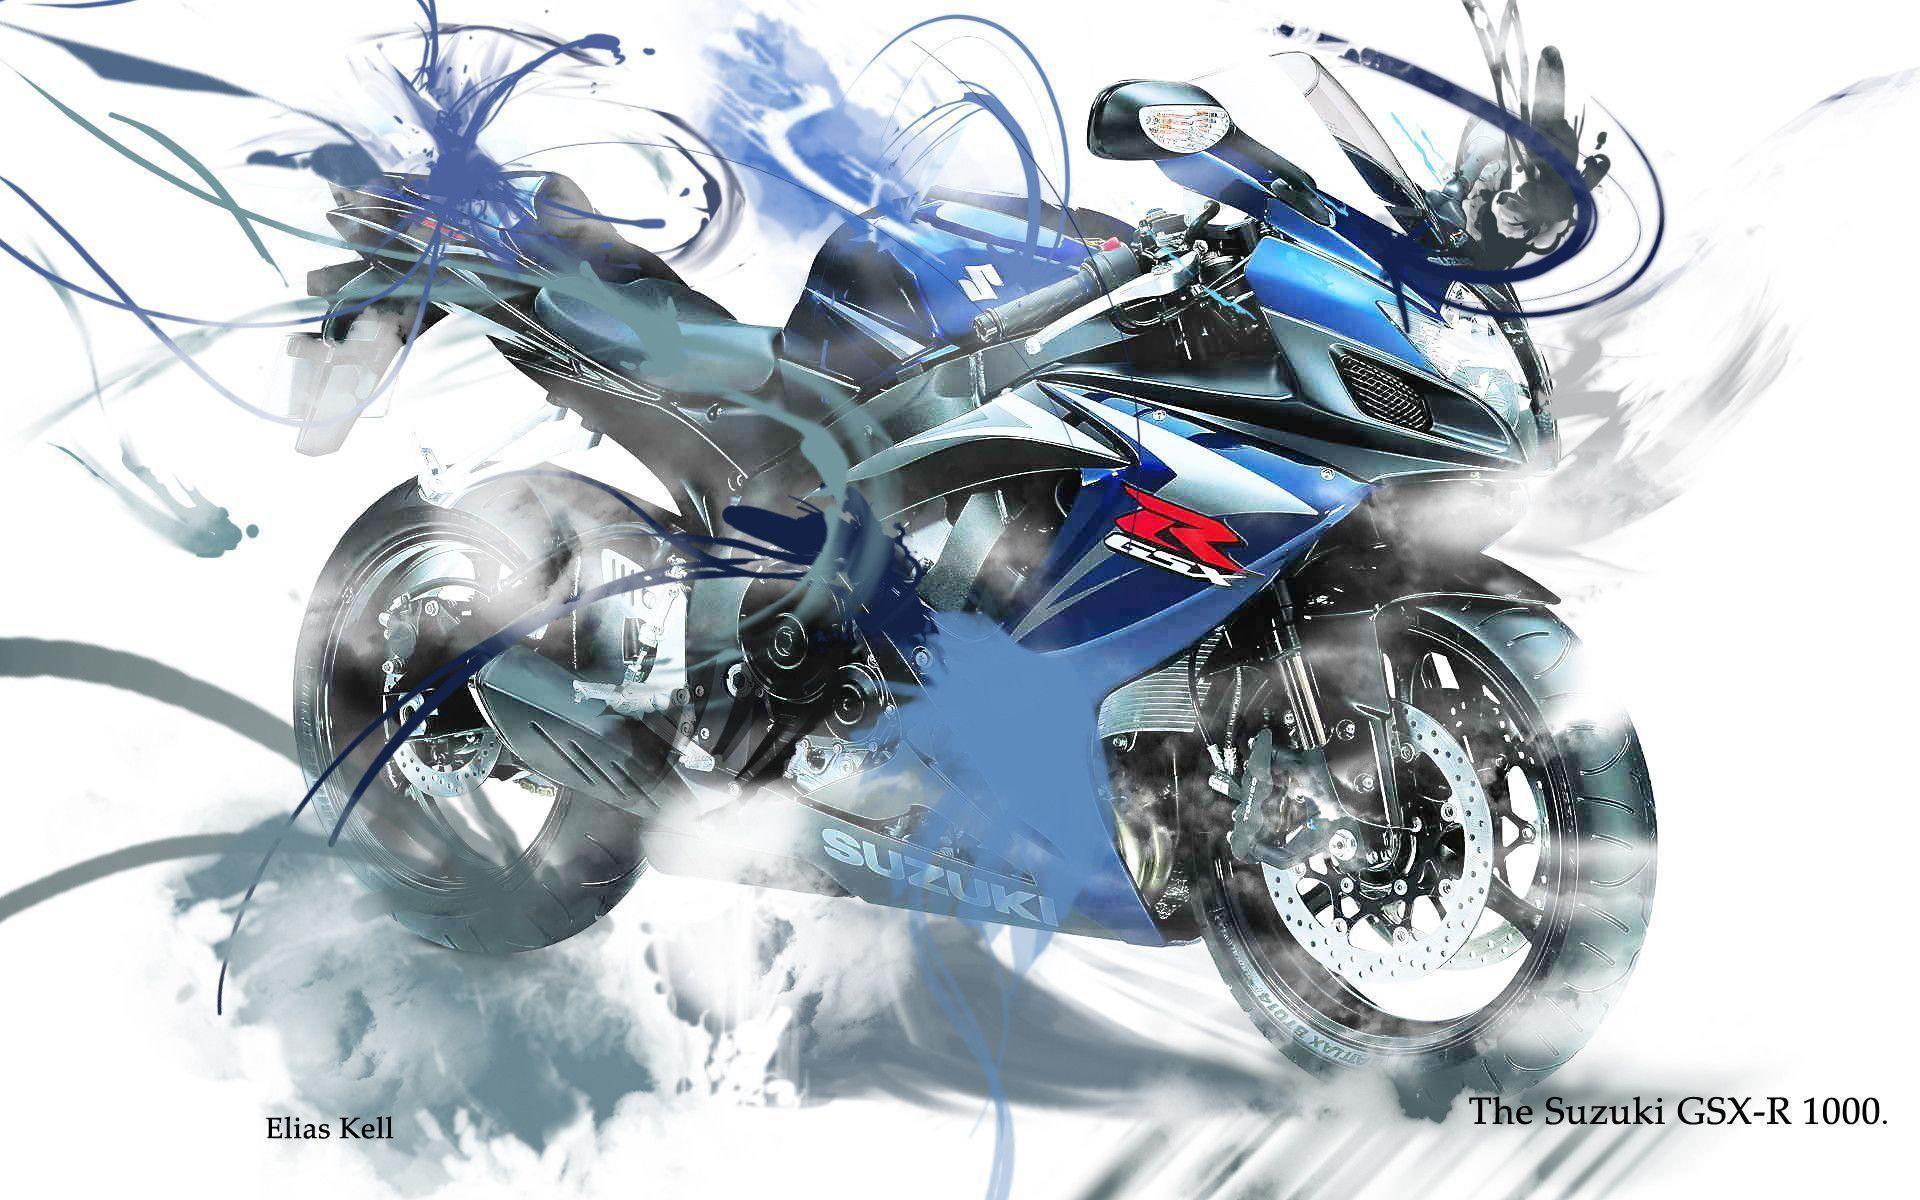 Suzuki Gsxr 1000 Wallpaper 18720 Hd Wallpapers in Bikes – Telusers.